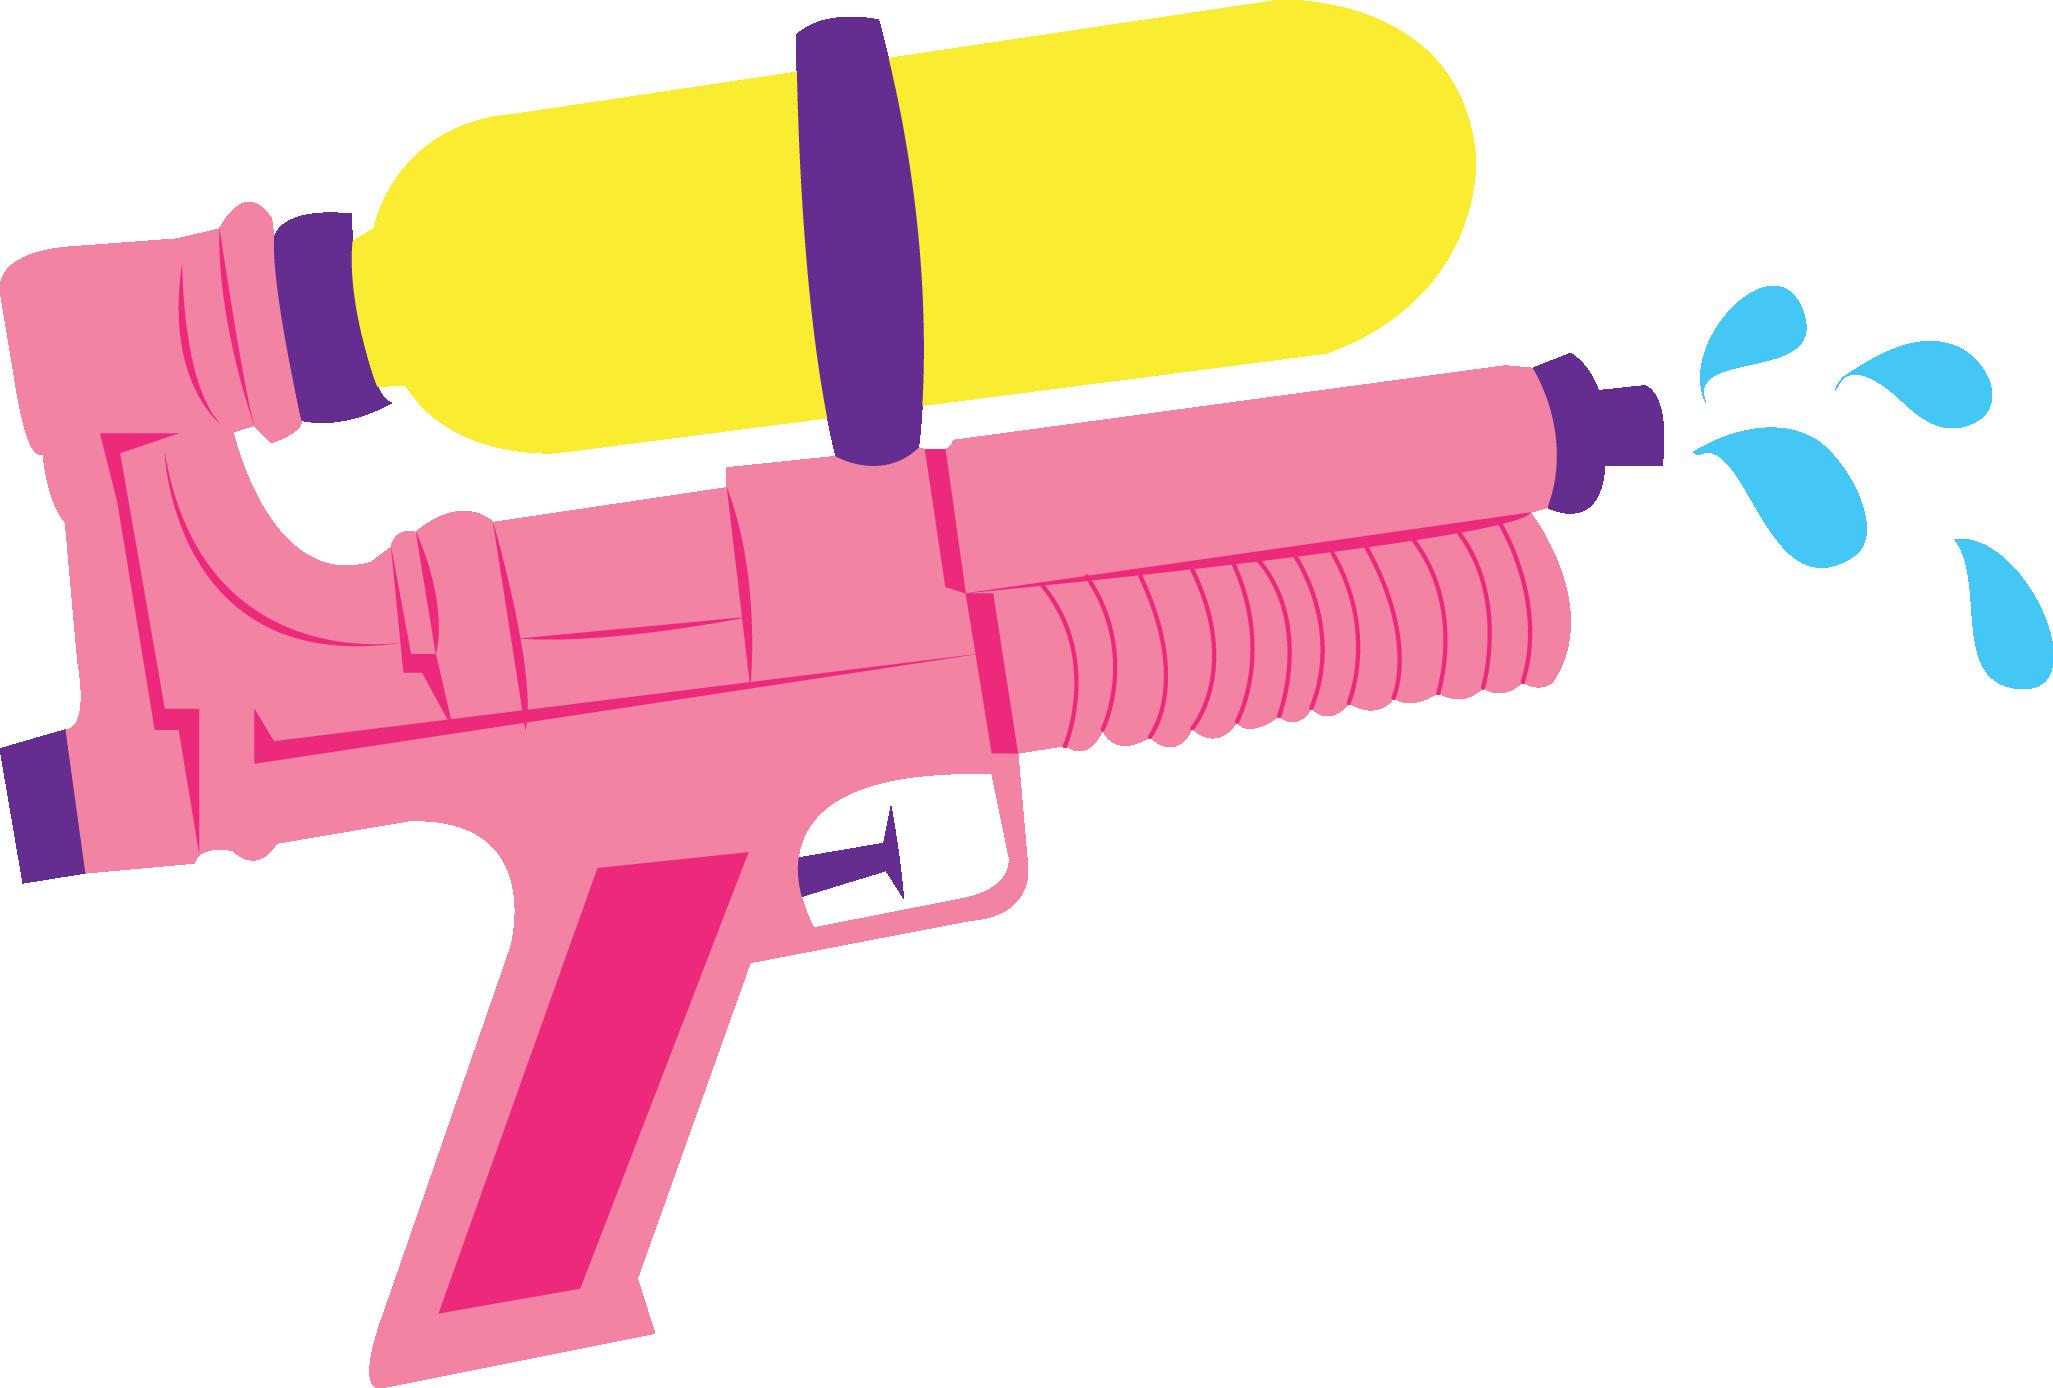 clip stock Guns clipart toy gun. Photo by kammytroquinhas minus